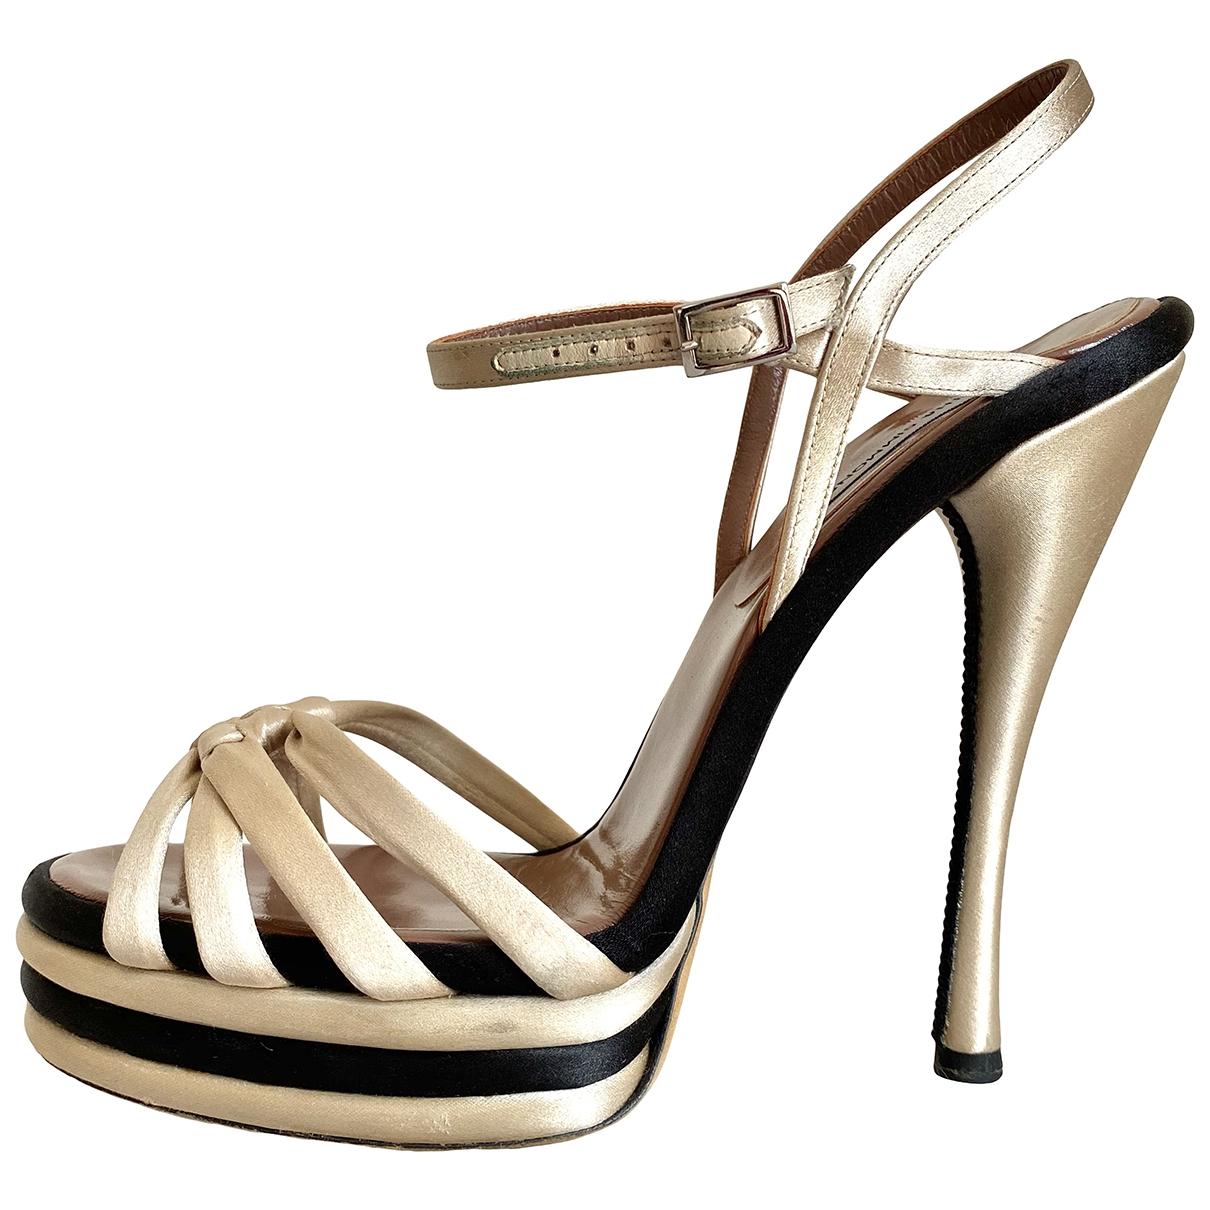 Sandalias de Lona Tabitha Simmons